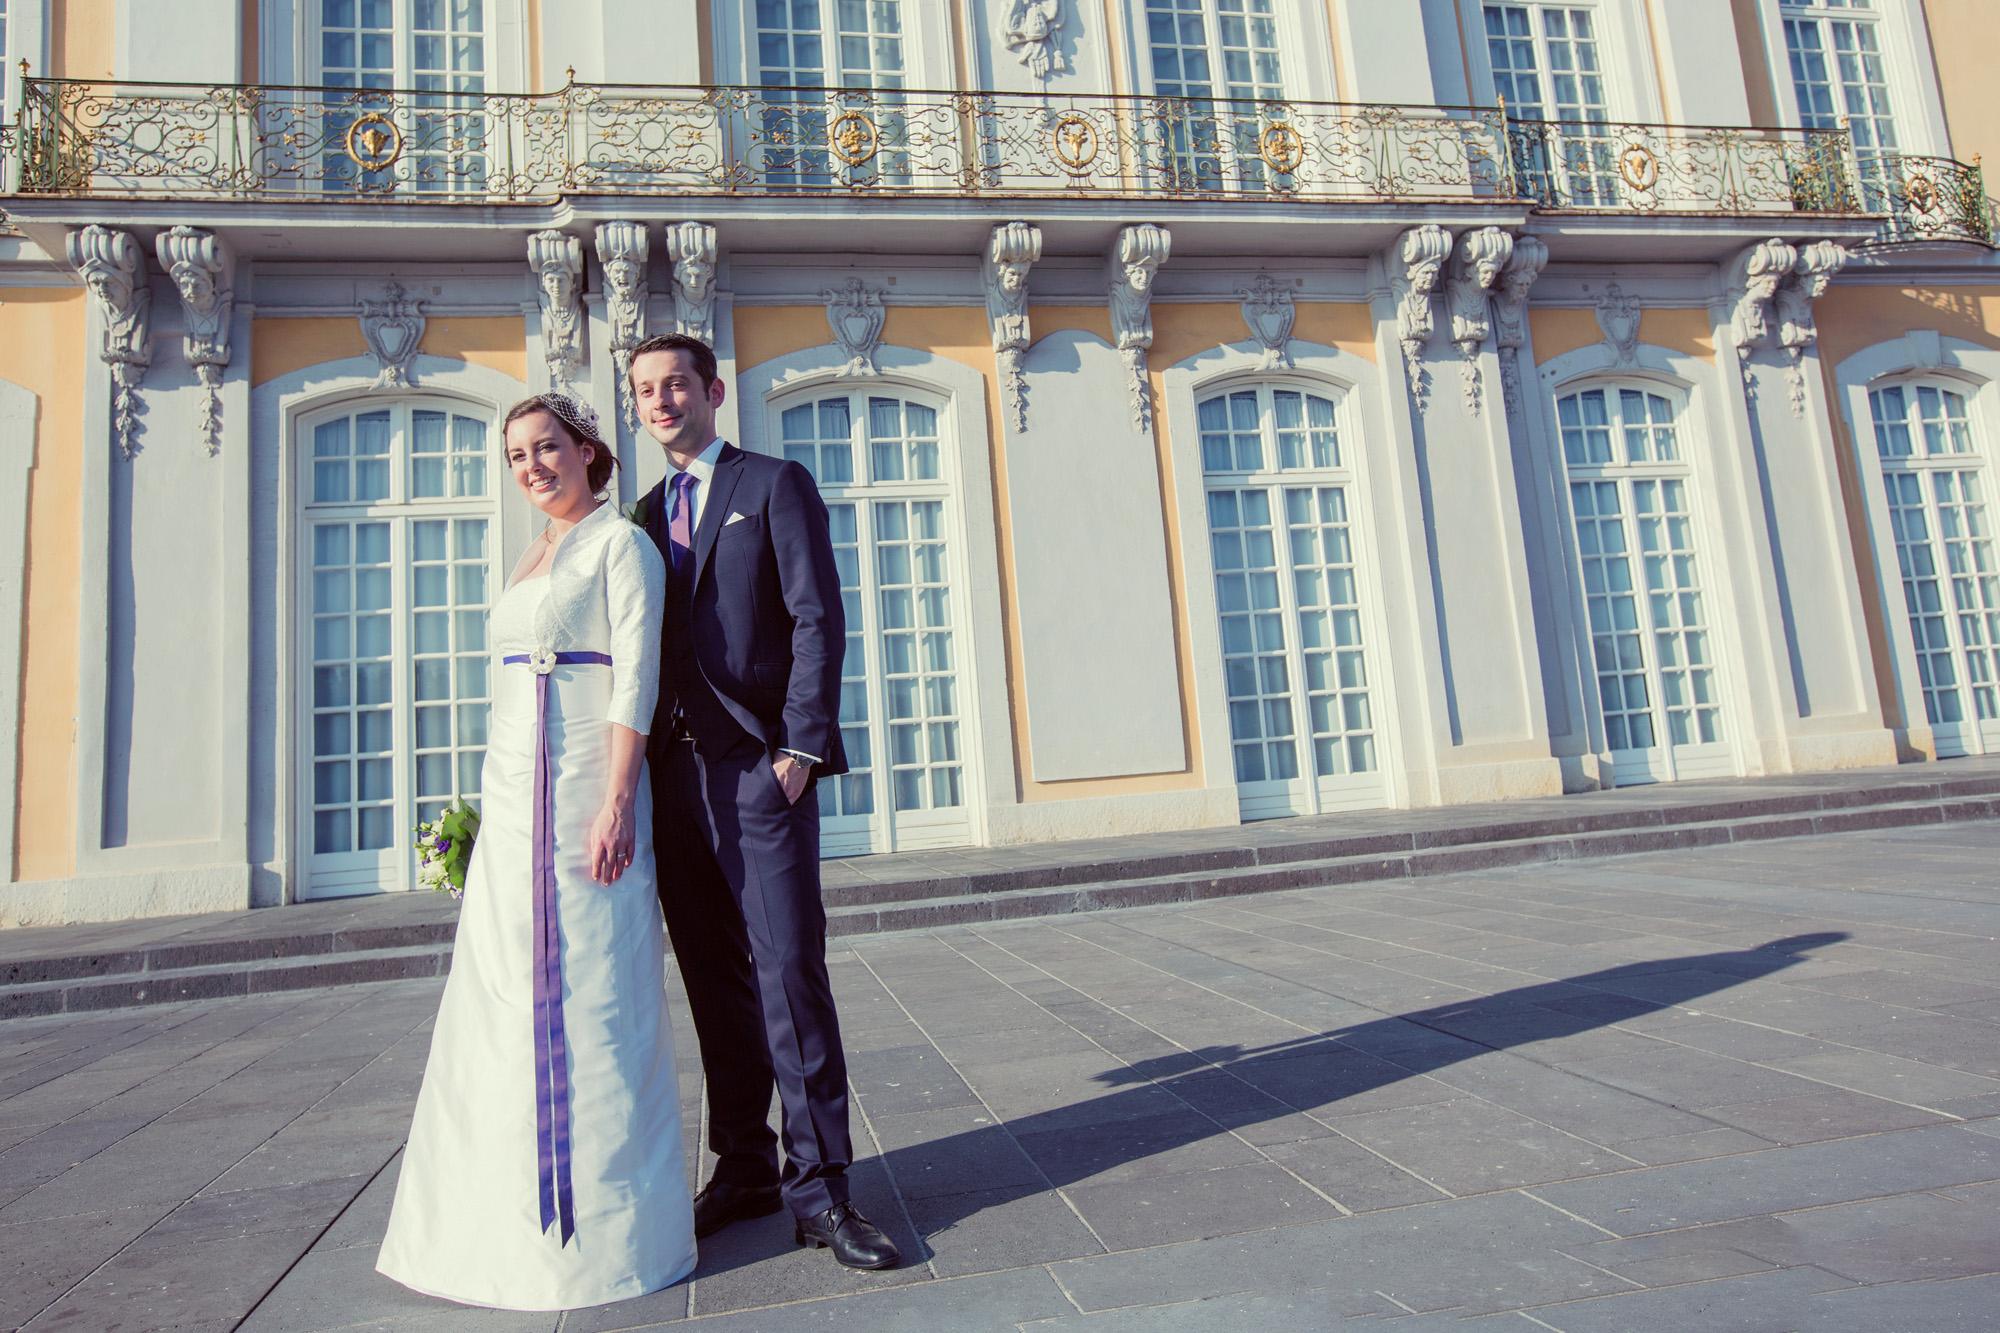 Hochzeit-Schloss-Bruehl_26.jpg